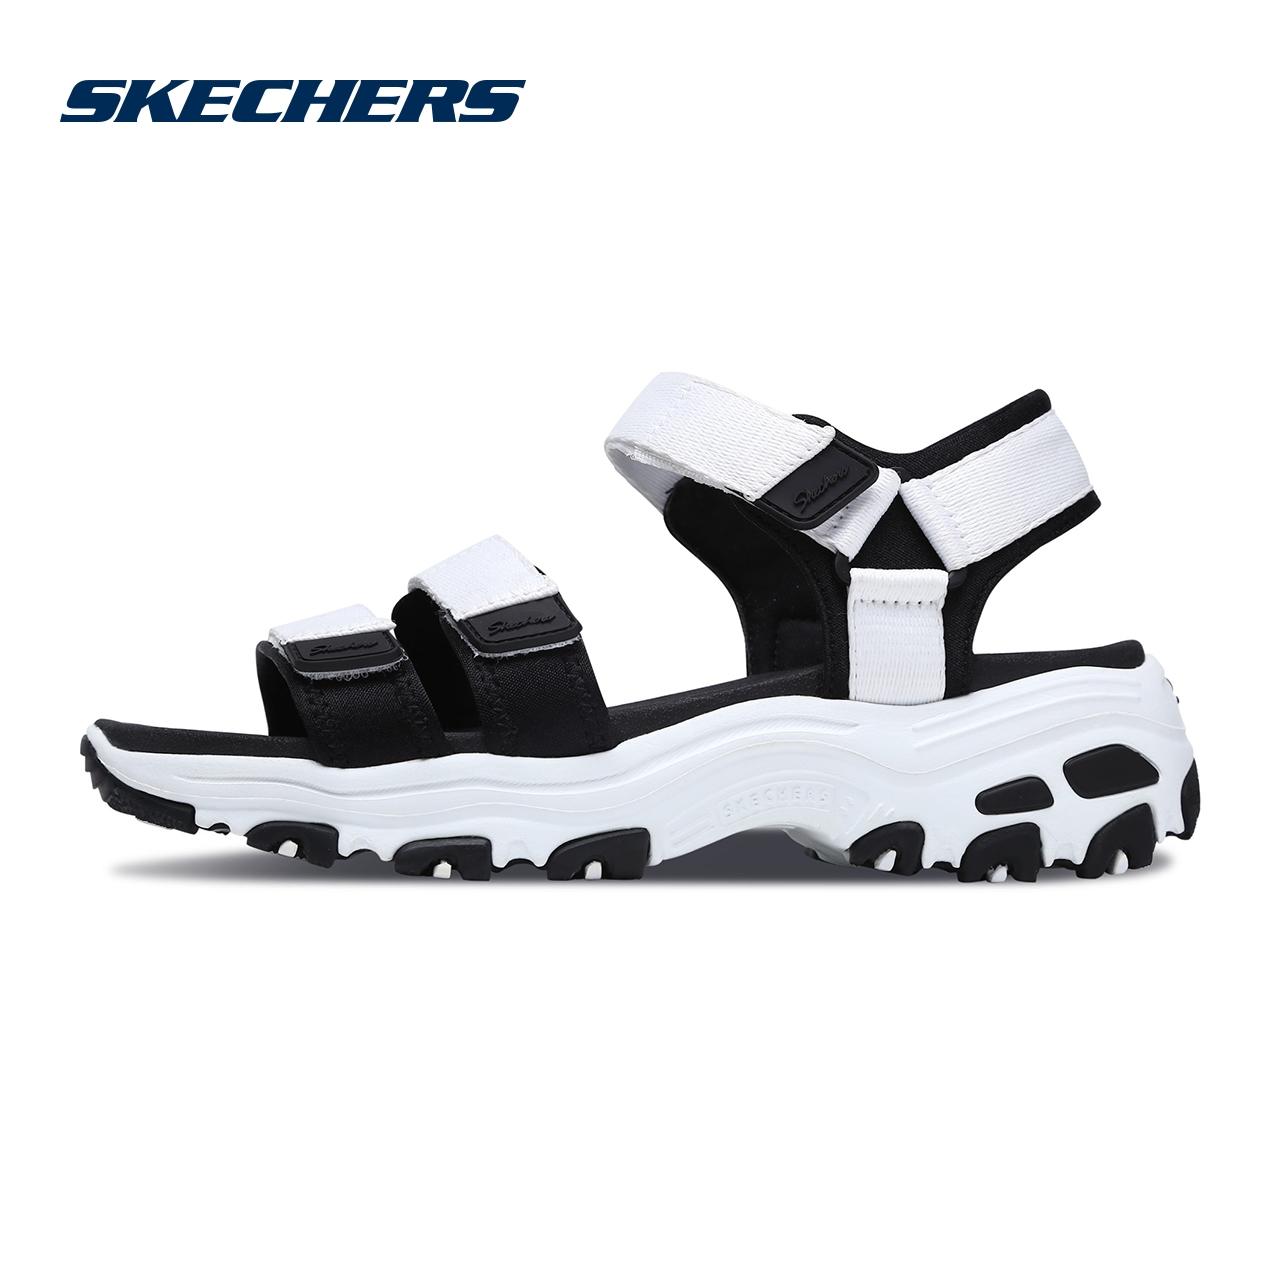 Skechers斯凯奇女鞋 Dlites 厚底增高凉鞋 魔术贴休闲鞋31514